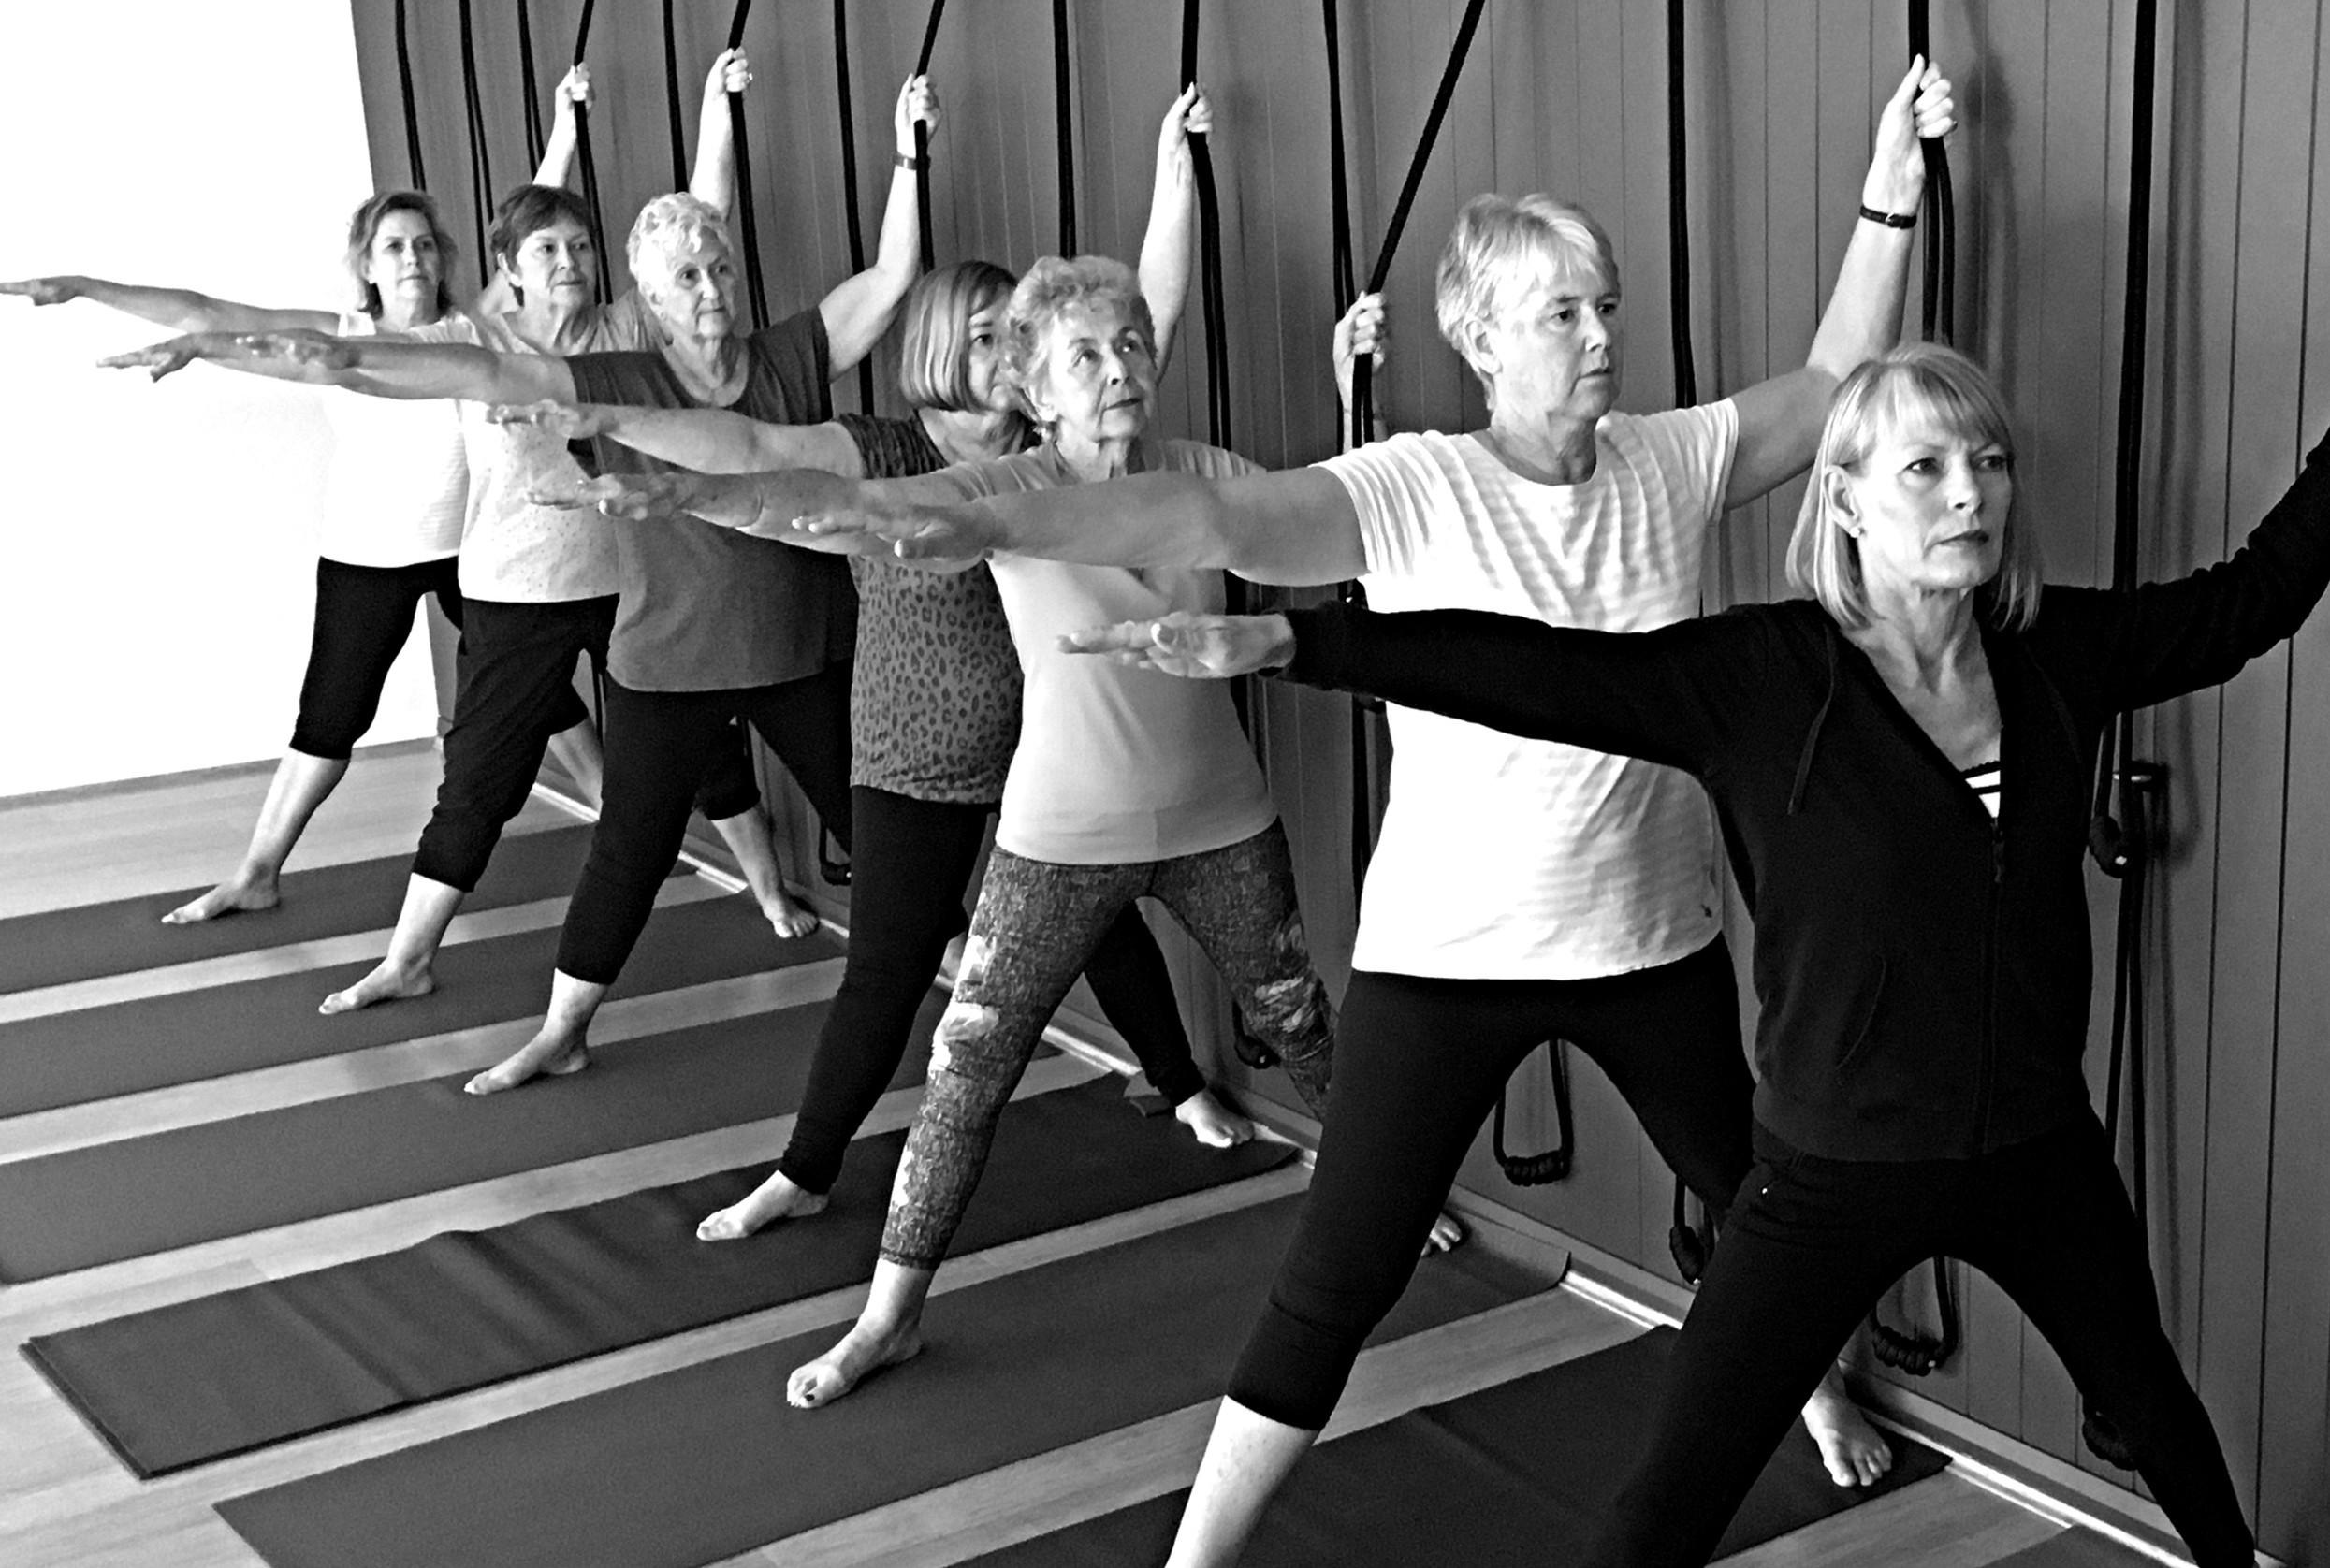 In-person Seniors yoga